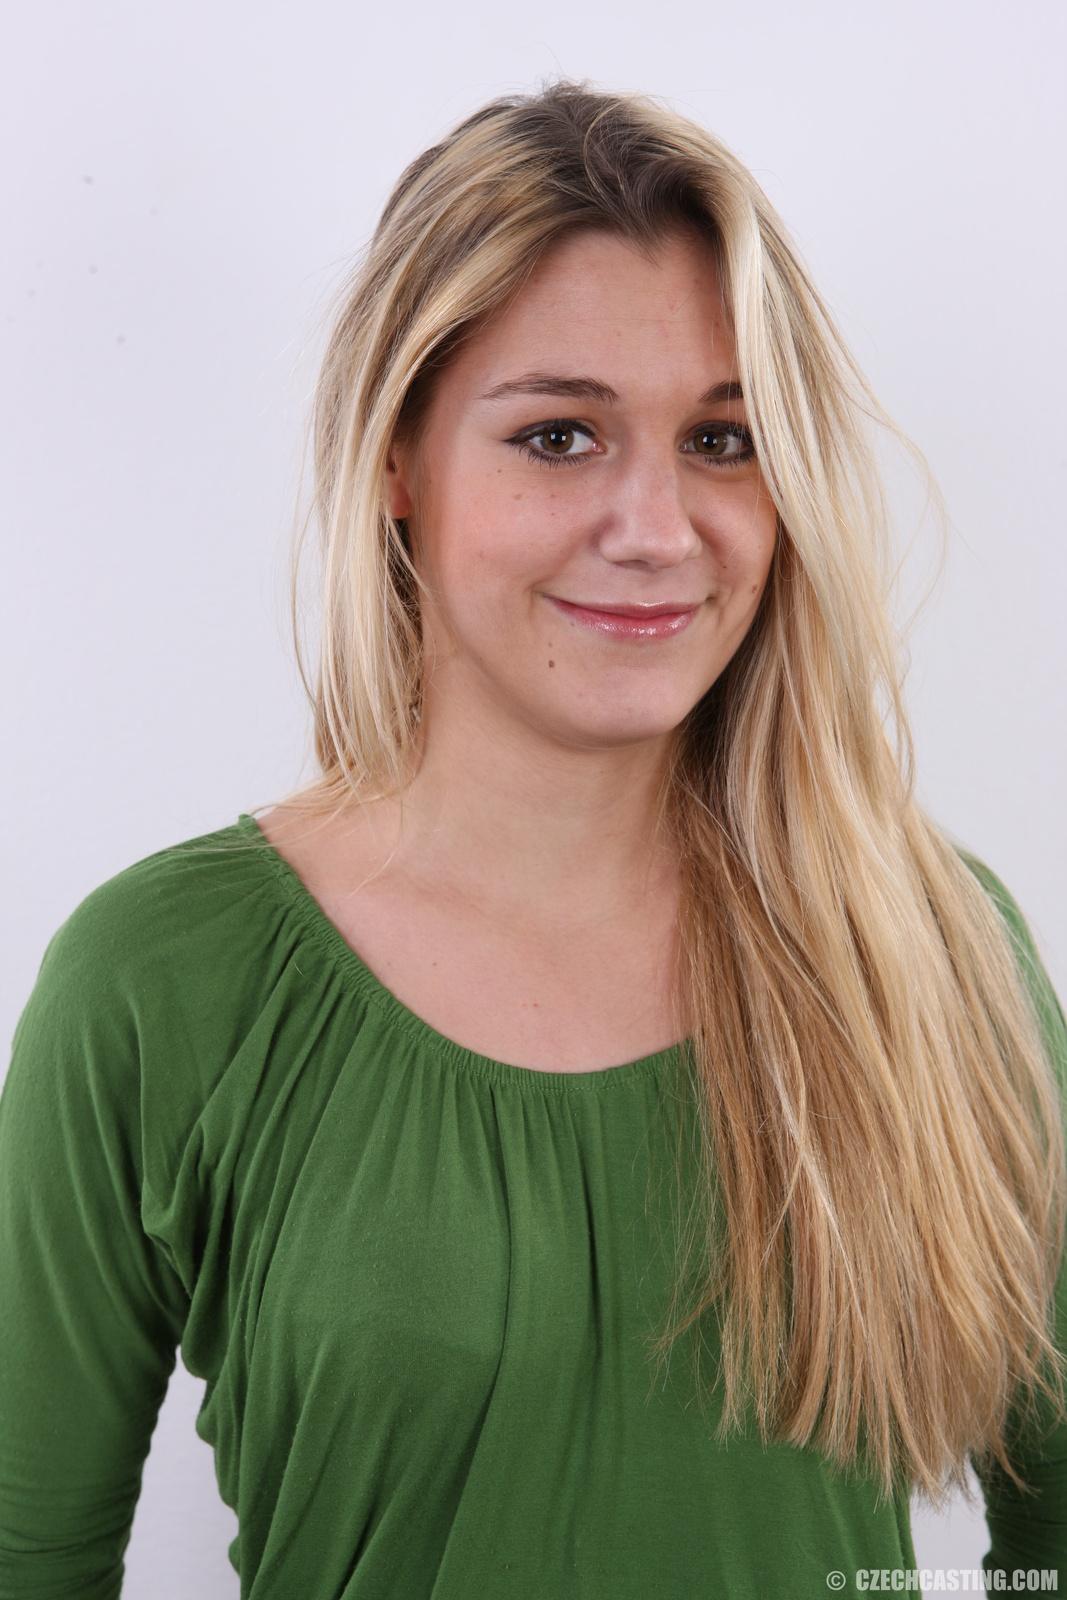 Tereza - Czech Casting